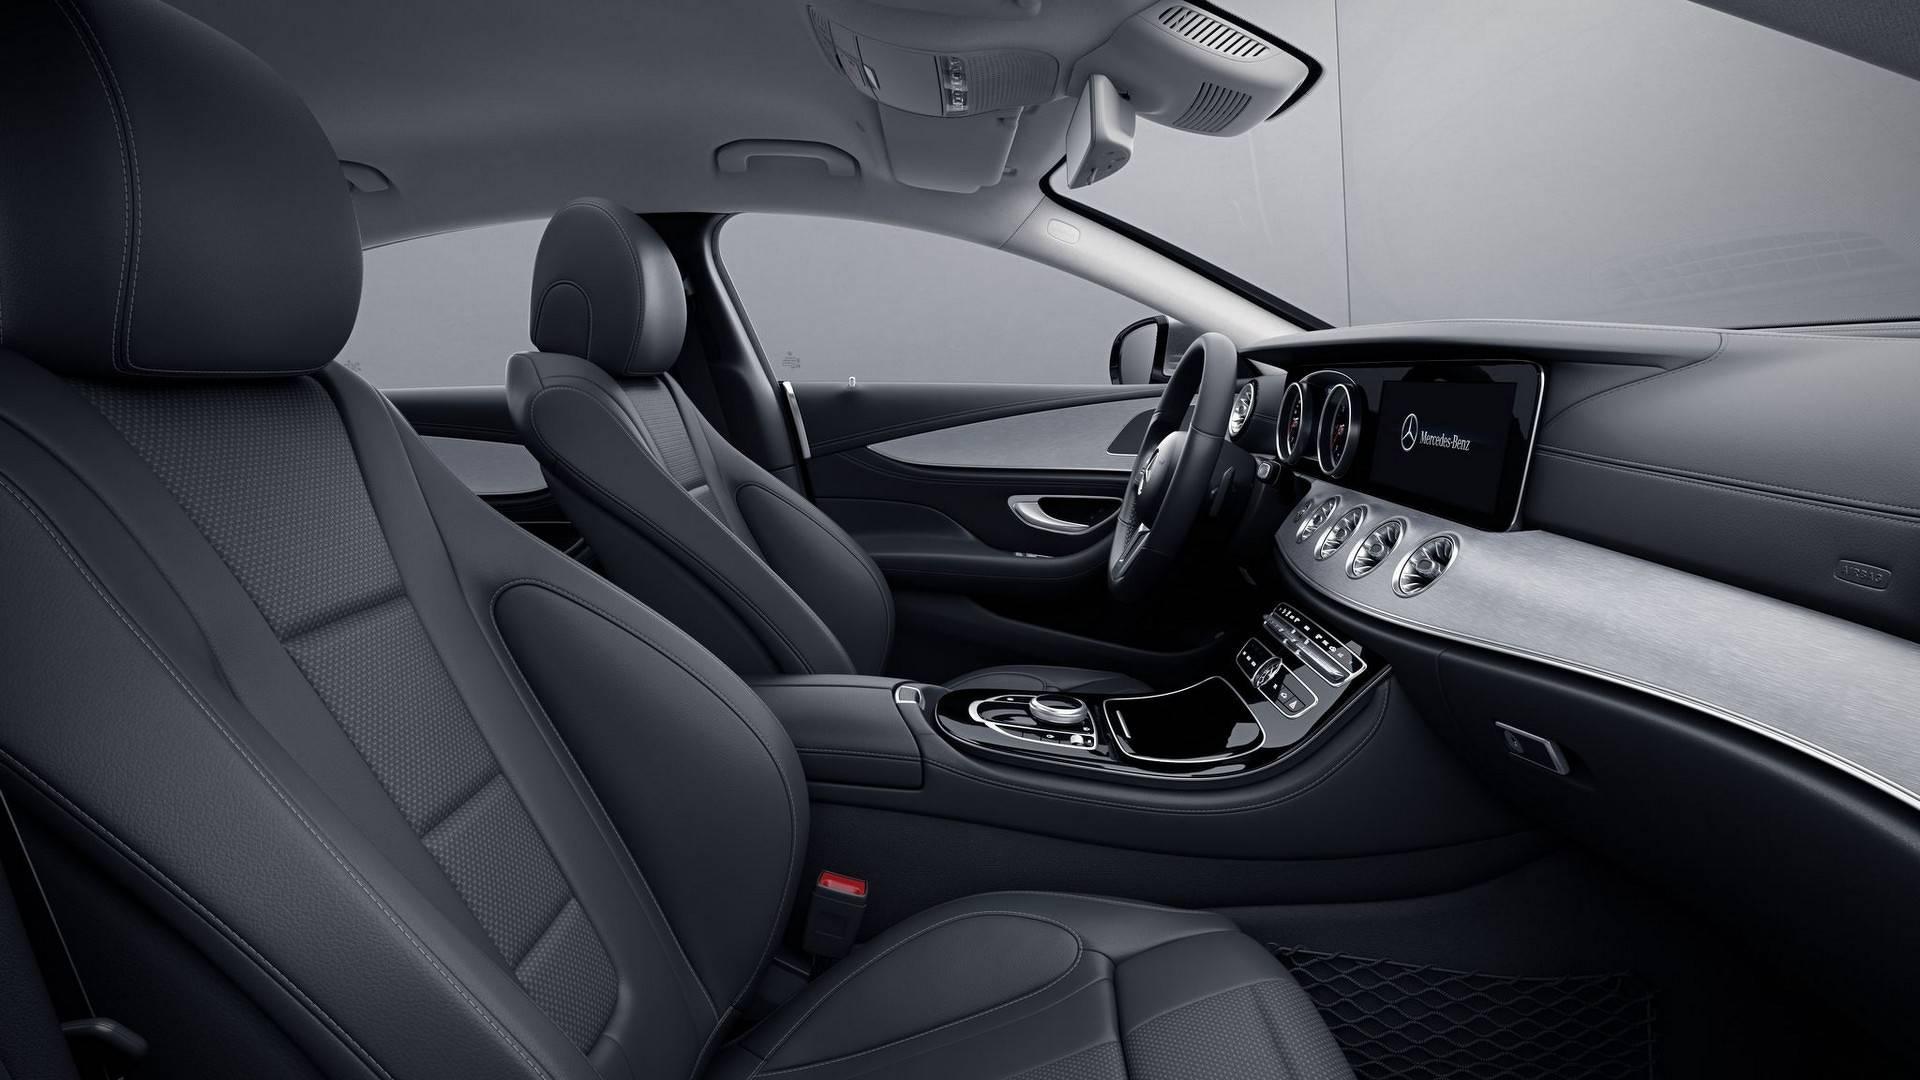 2019 Mercedes Benz Cls450 Introduces Mild Hybrid Powertrain 300e Fuel Filter Location